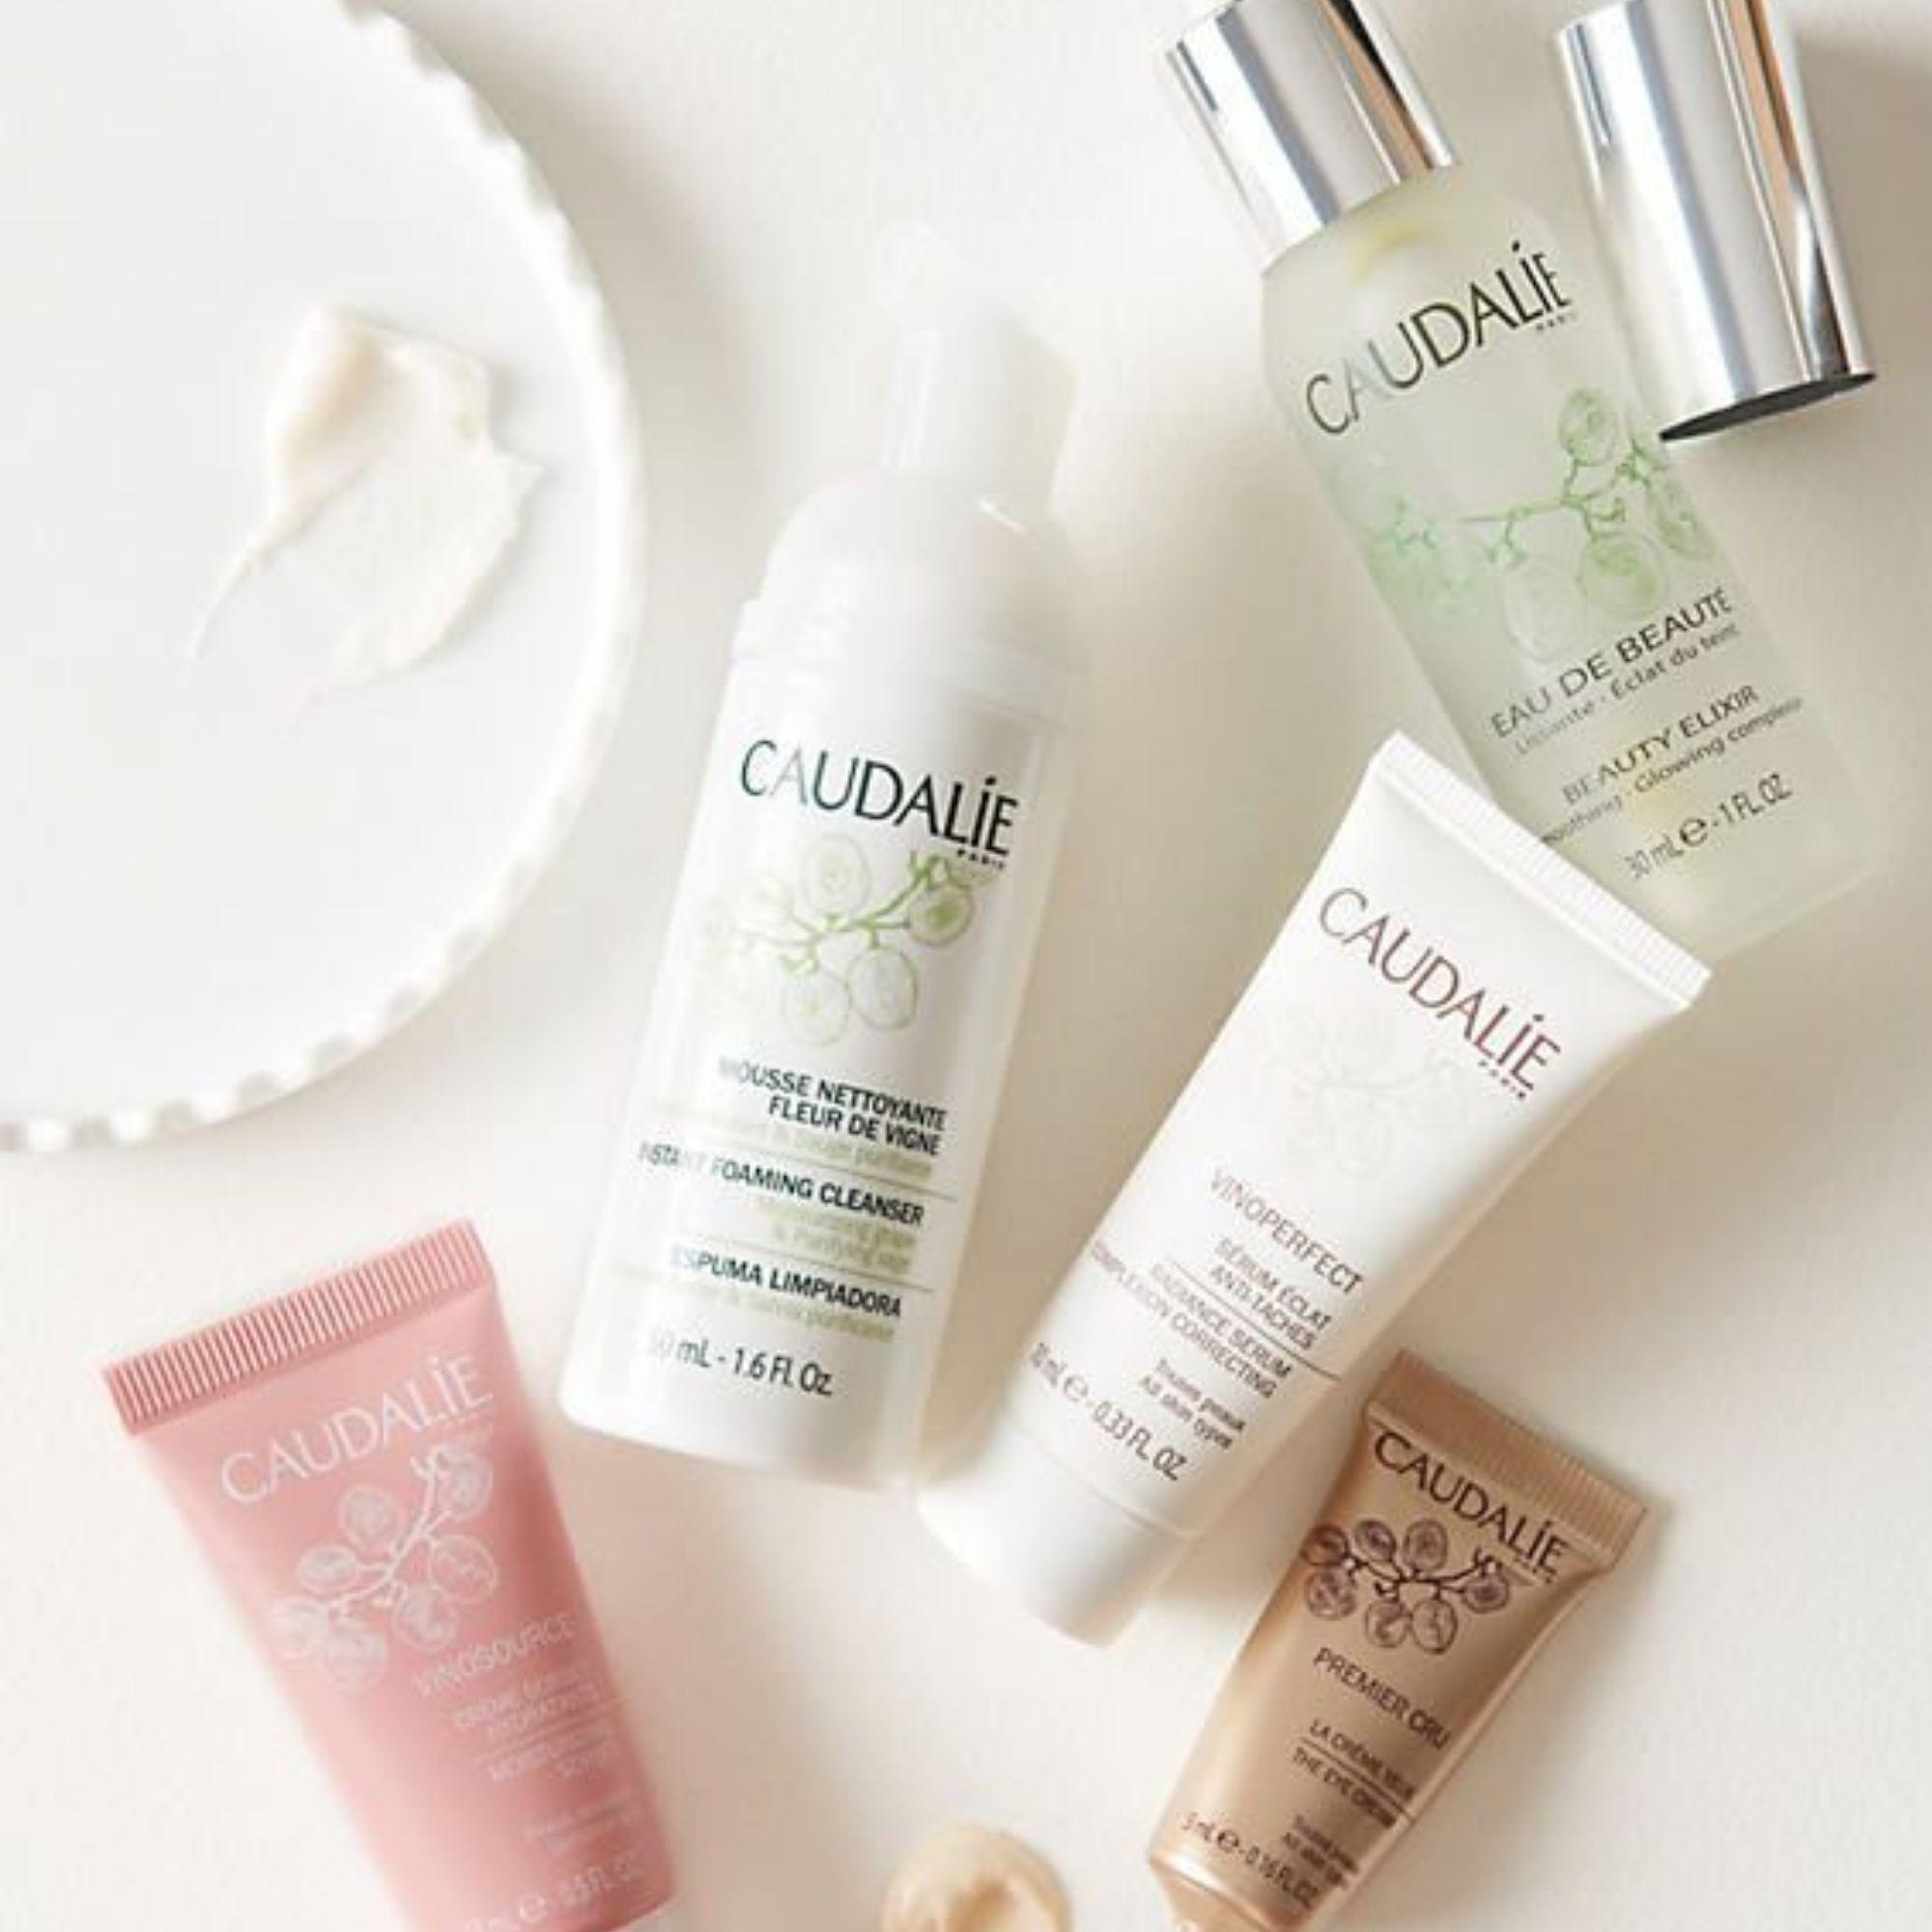 Caudalie skincare products flatlay